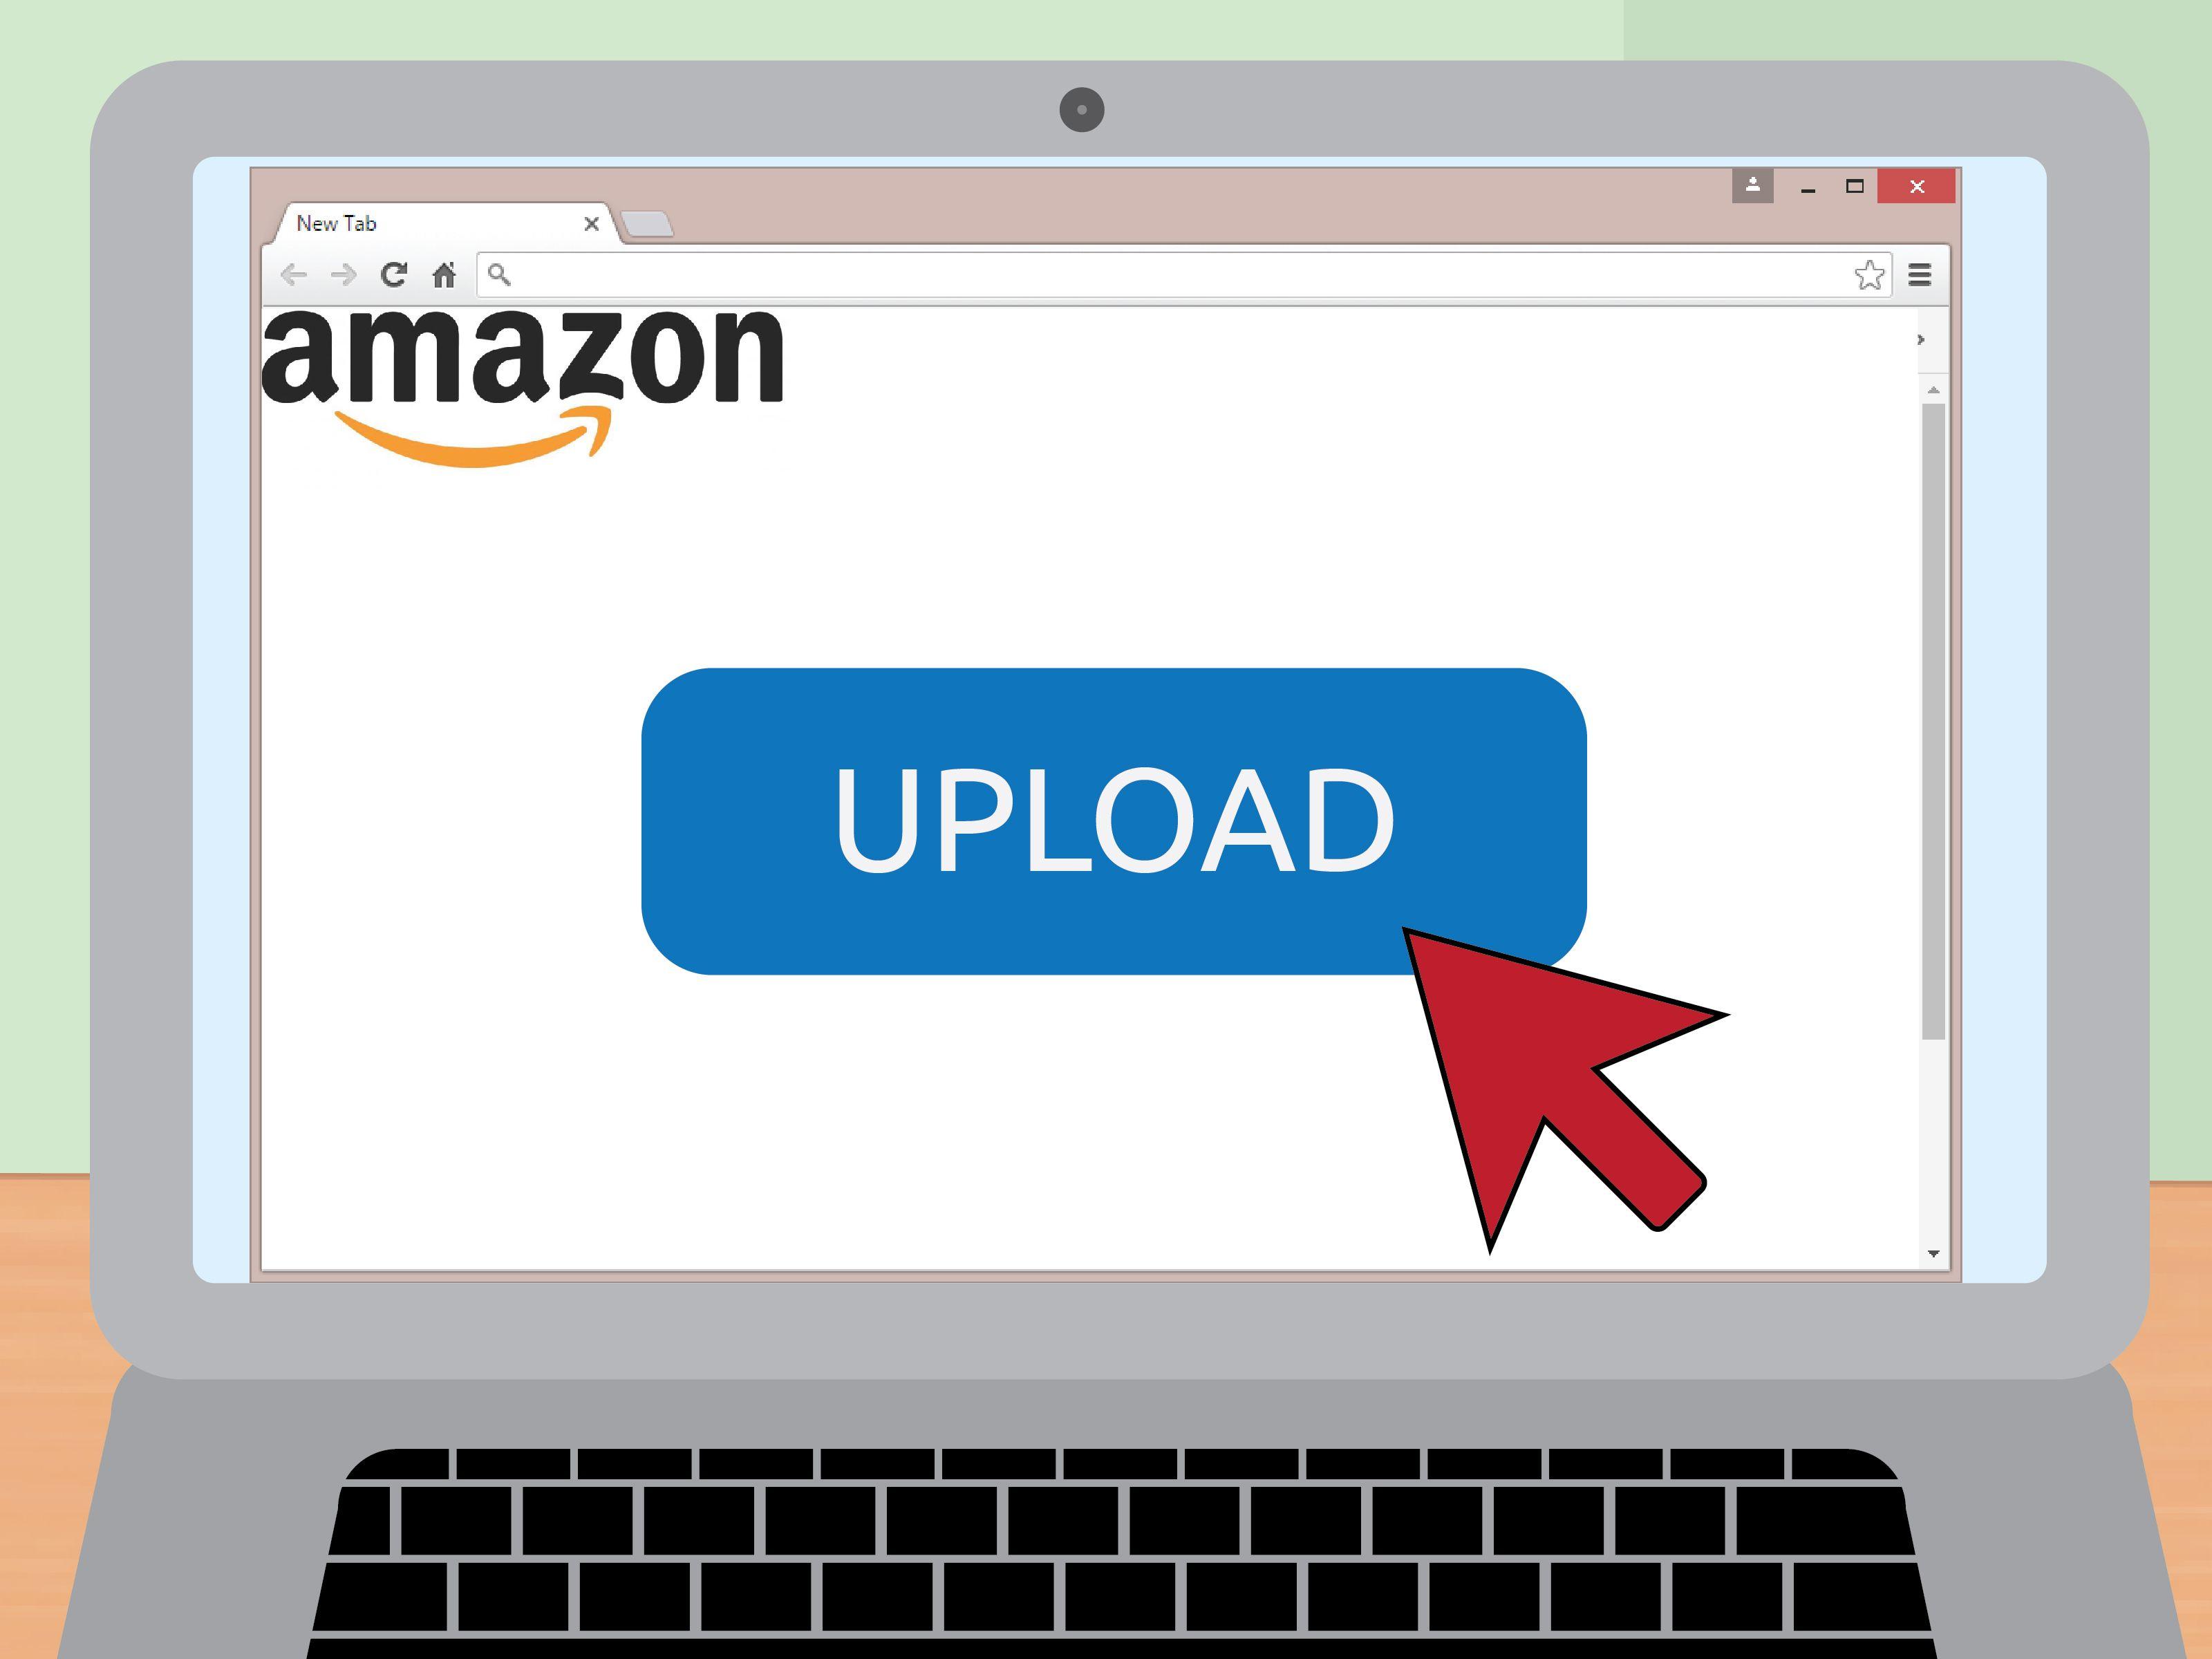 e8042e4d4e6398ed19f69d2f183de2be - How To Get Asin For New Product On Amazon